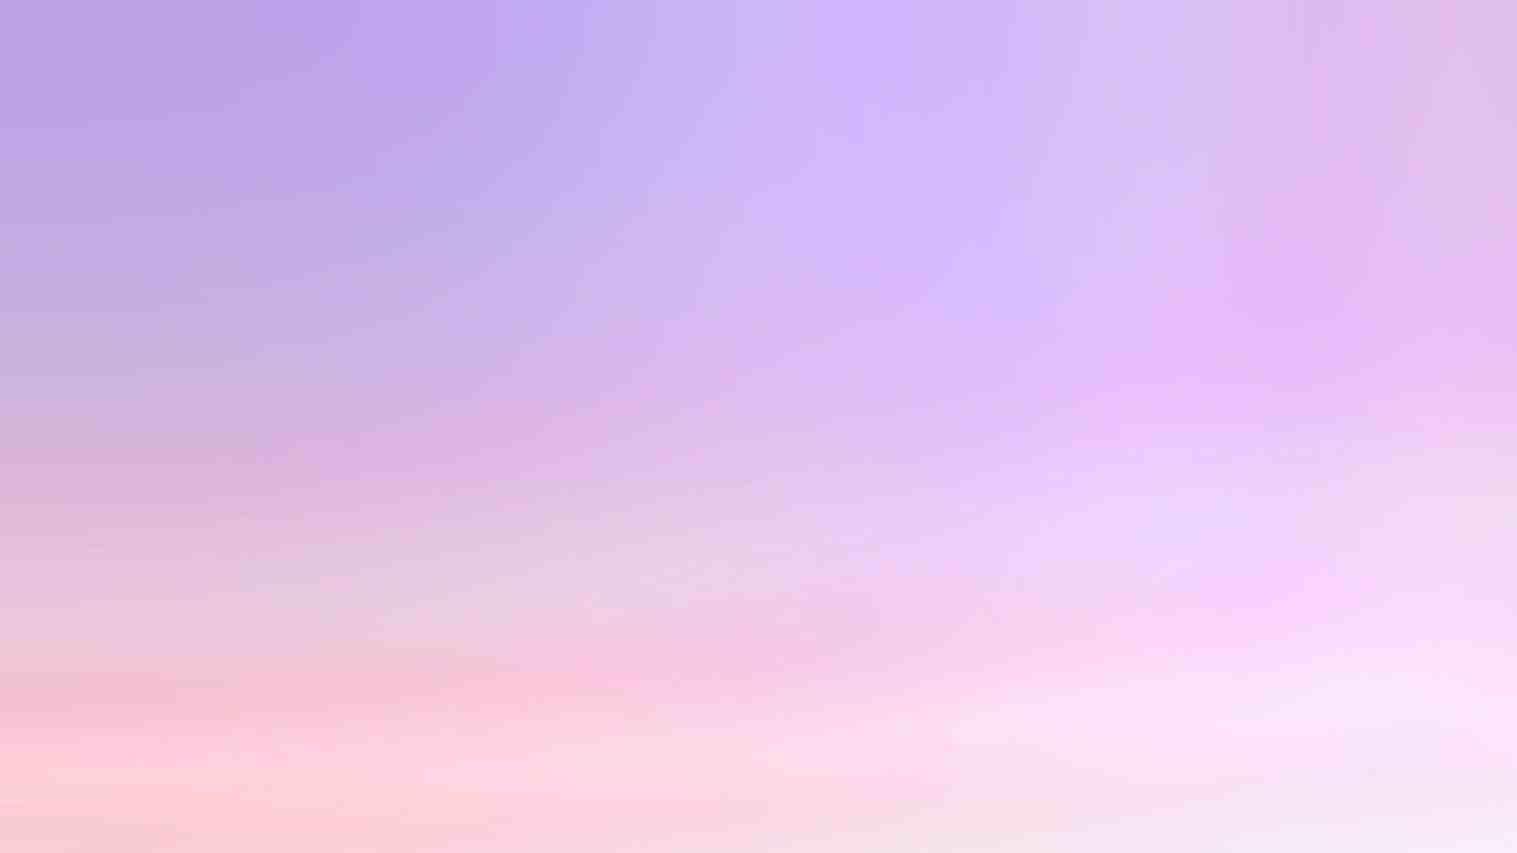 Purple Pink Aesthetic Wallpapers Top Free Purple Pink Aesthetic Backgrounds Wallpaperaccess